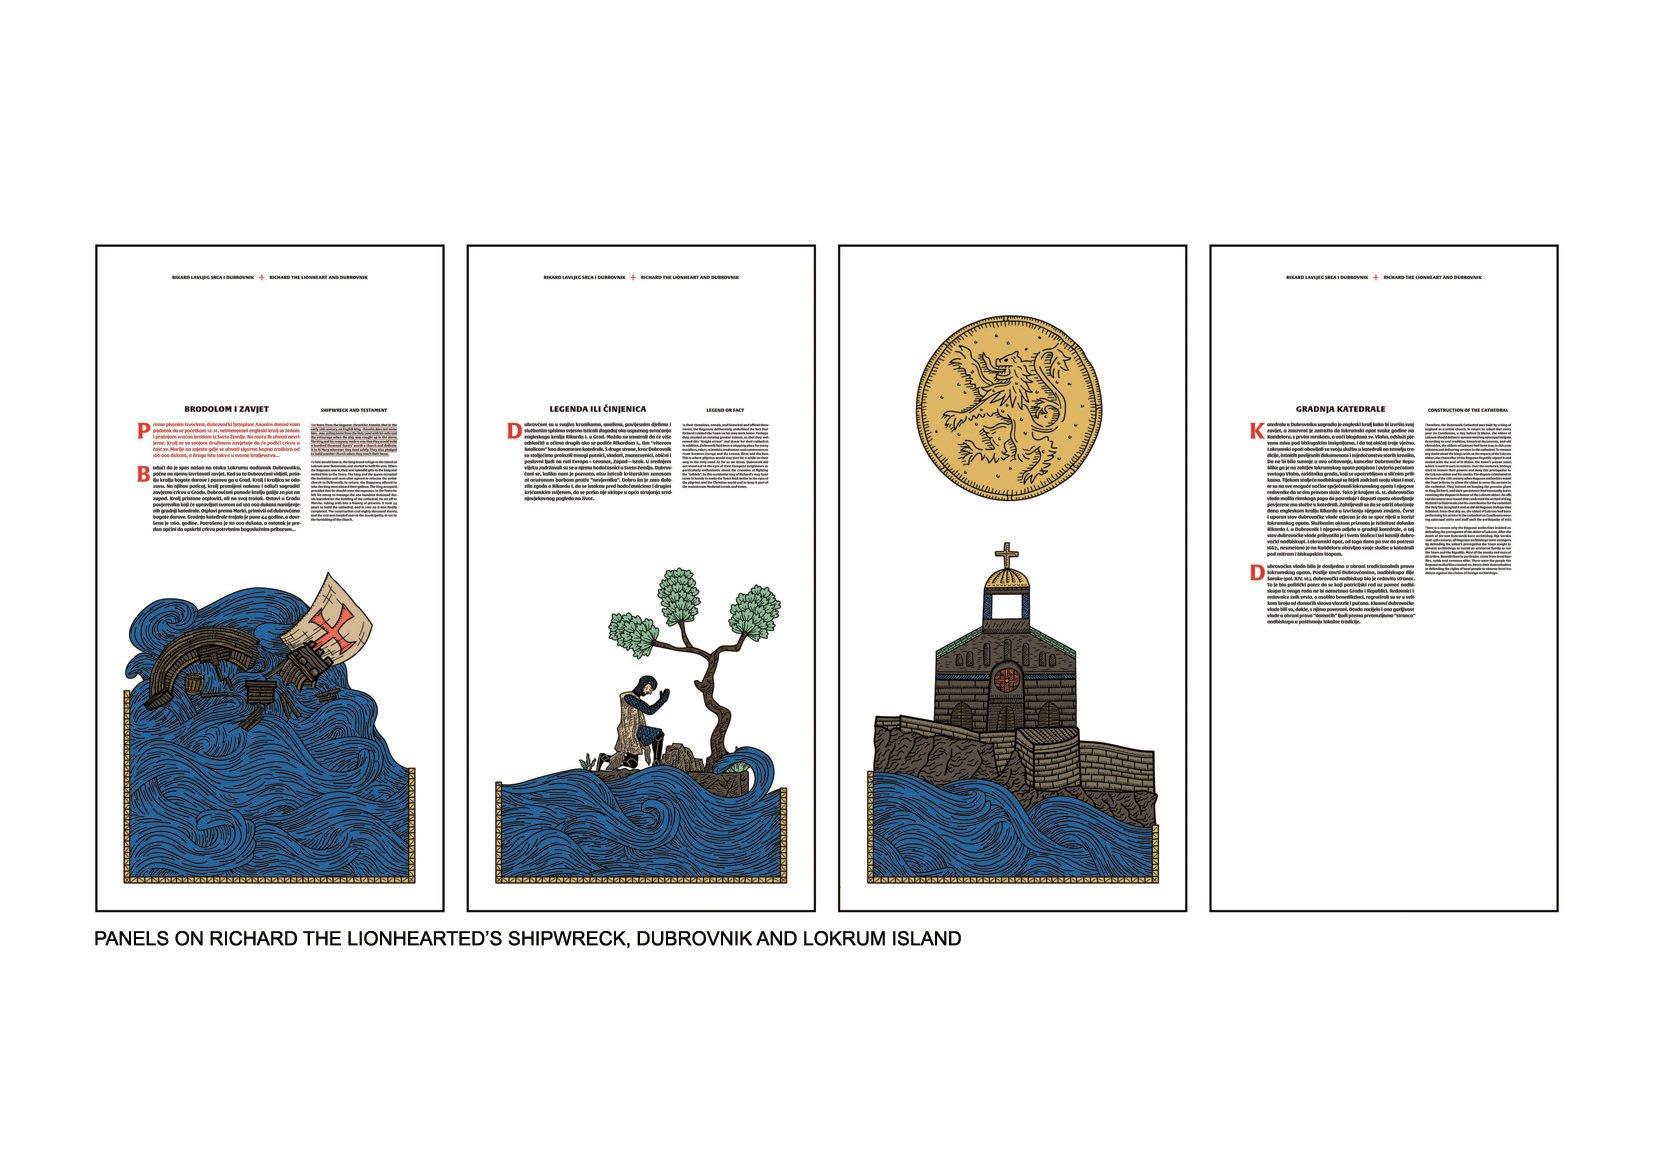 PANELS ON RICHARD THE LIONHEARTED'S SHIPWRECK, DUBORVNIK AND LOKRUM ISLAND OAZA}